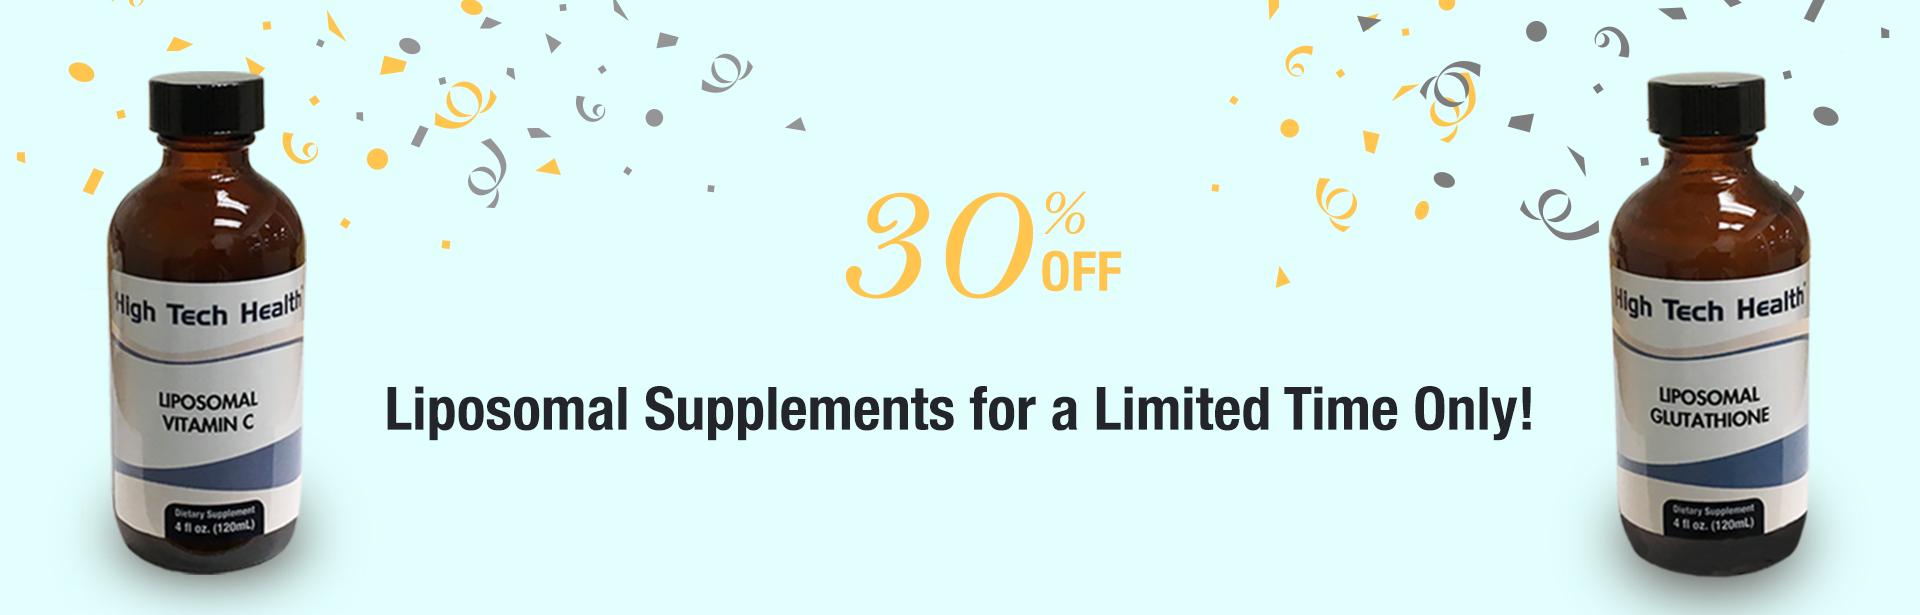 Save 30% on HTH liposomal supplements